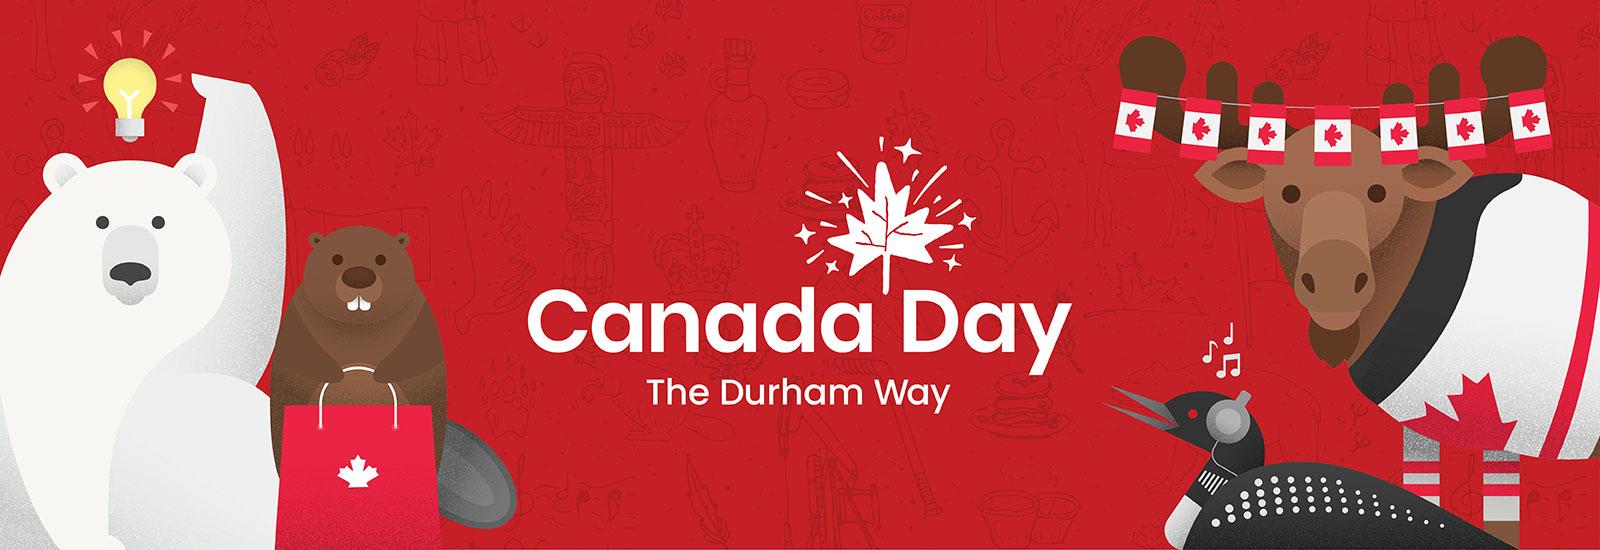 Canada Day - The Durham Way